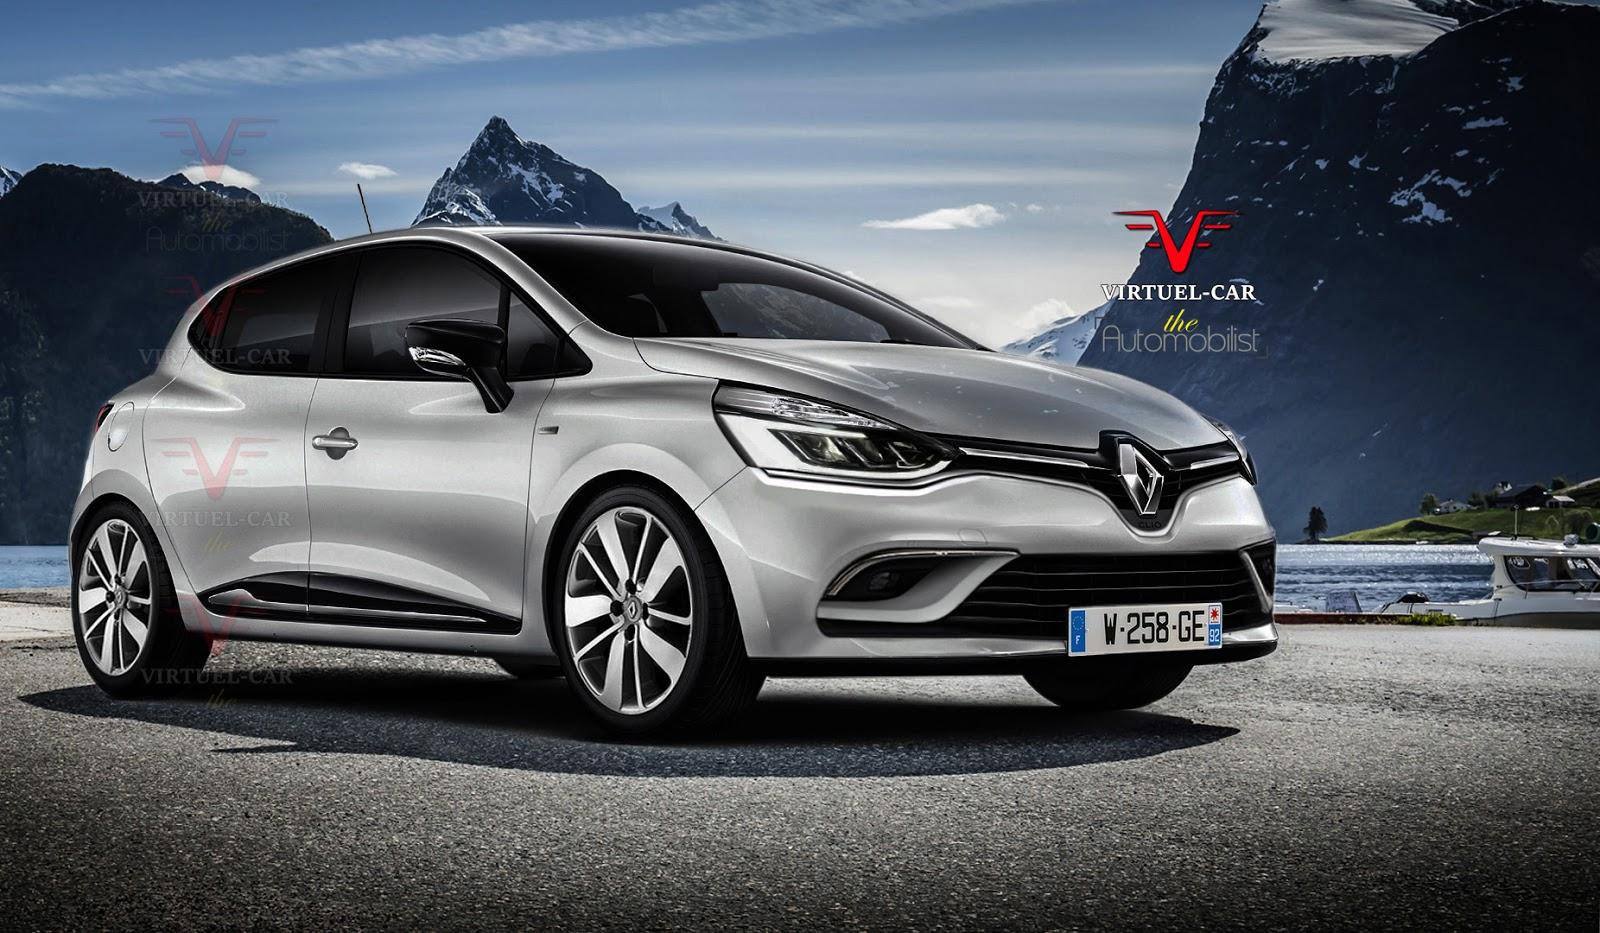 2017 Renault Clio Facelift Rendering